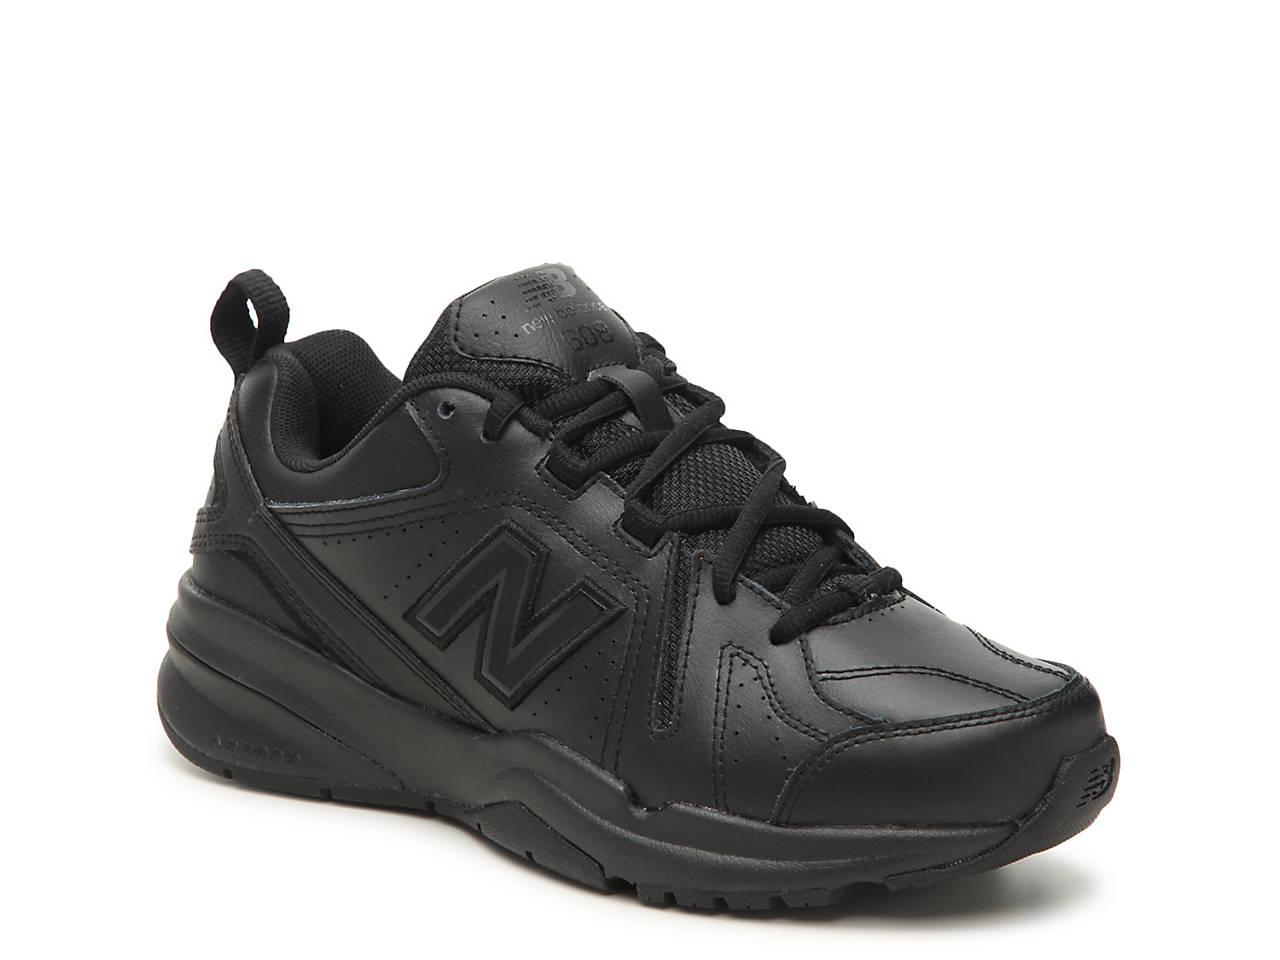 0add46f717ac New Balance 608 v5 Training Shoe - Women s Women s Shoes